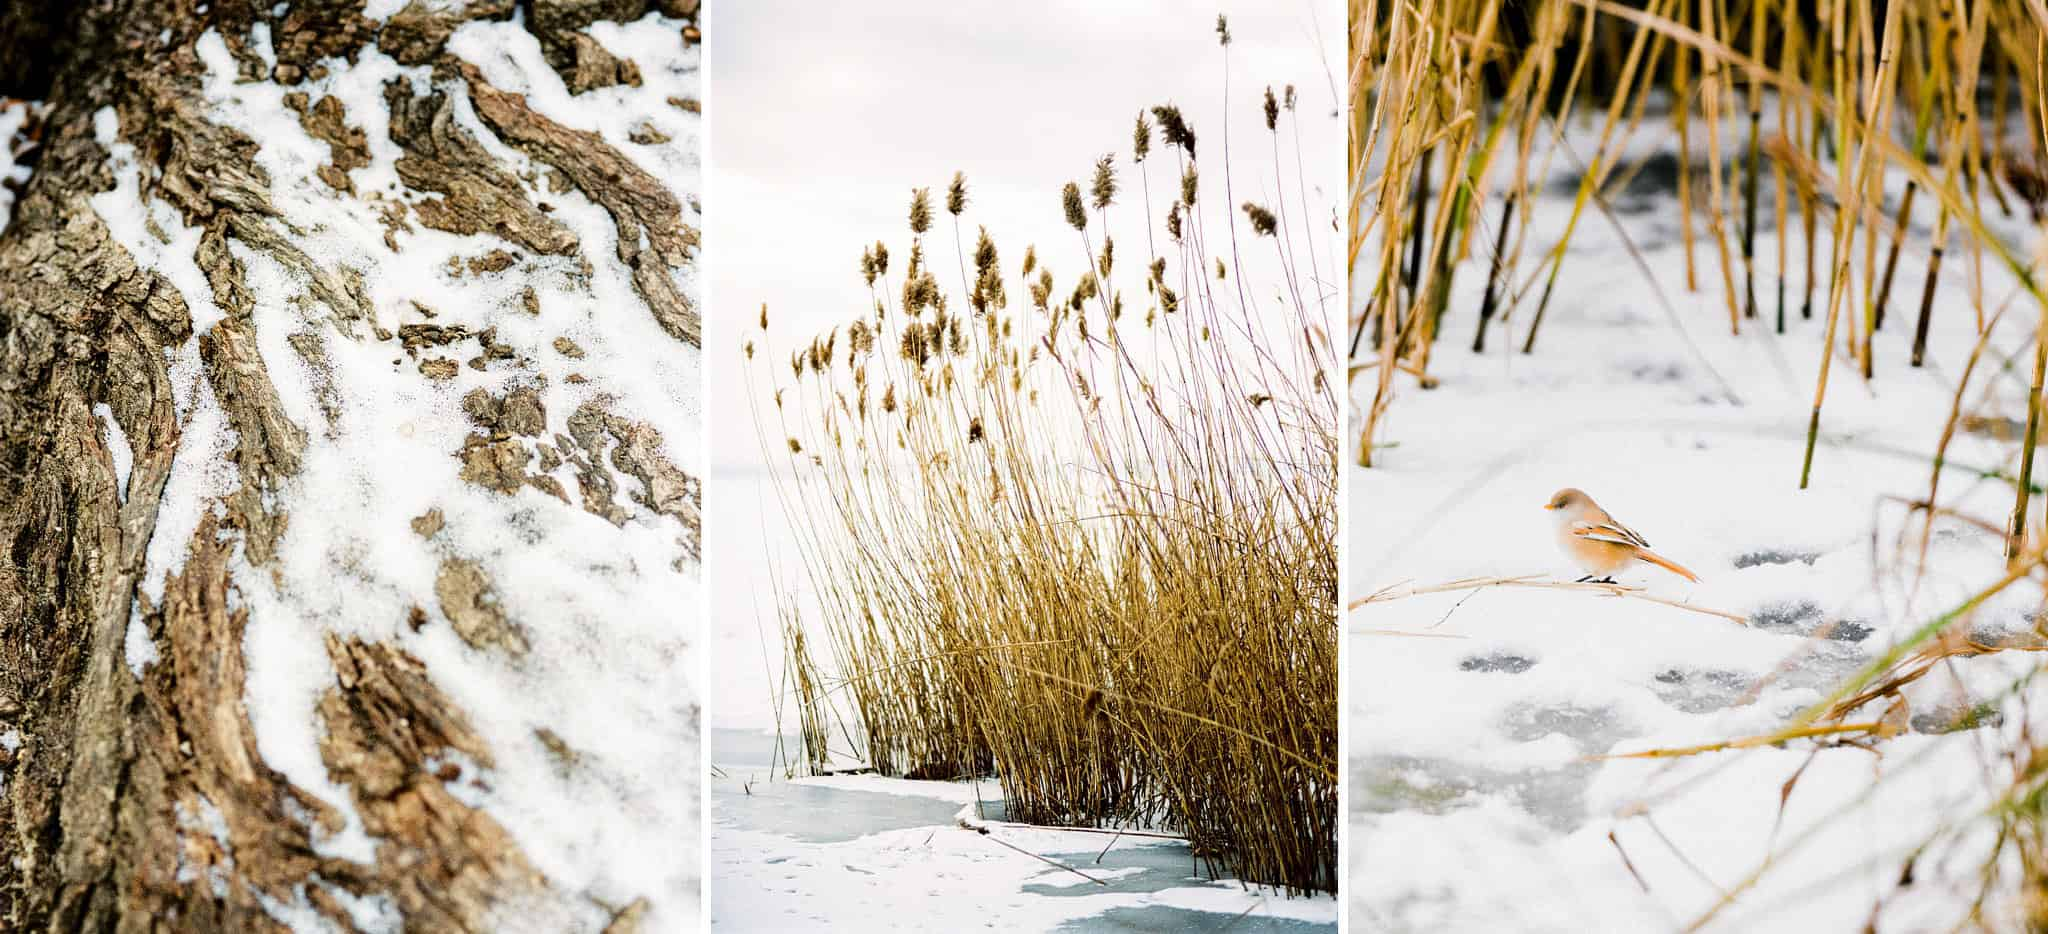 01_wedoverhills_winter_landscape_details